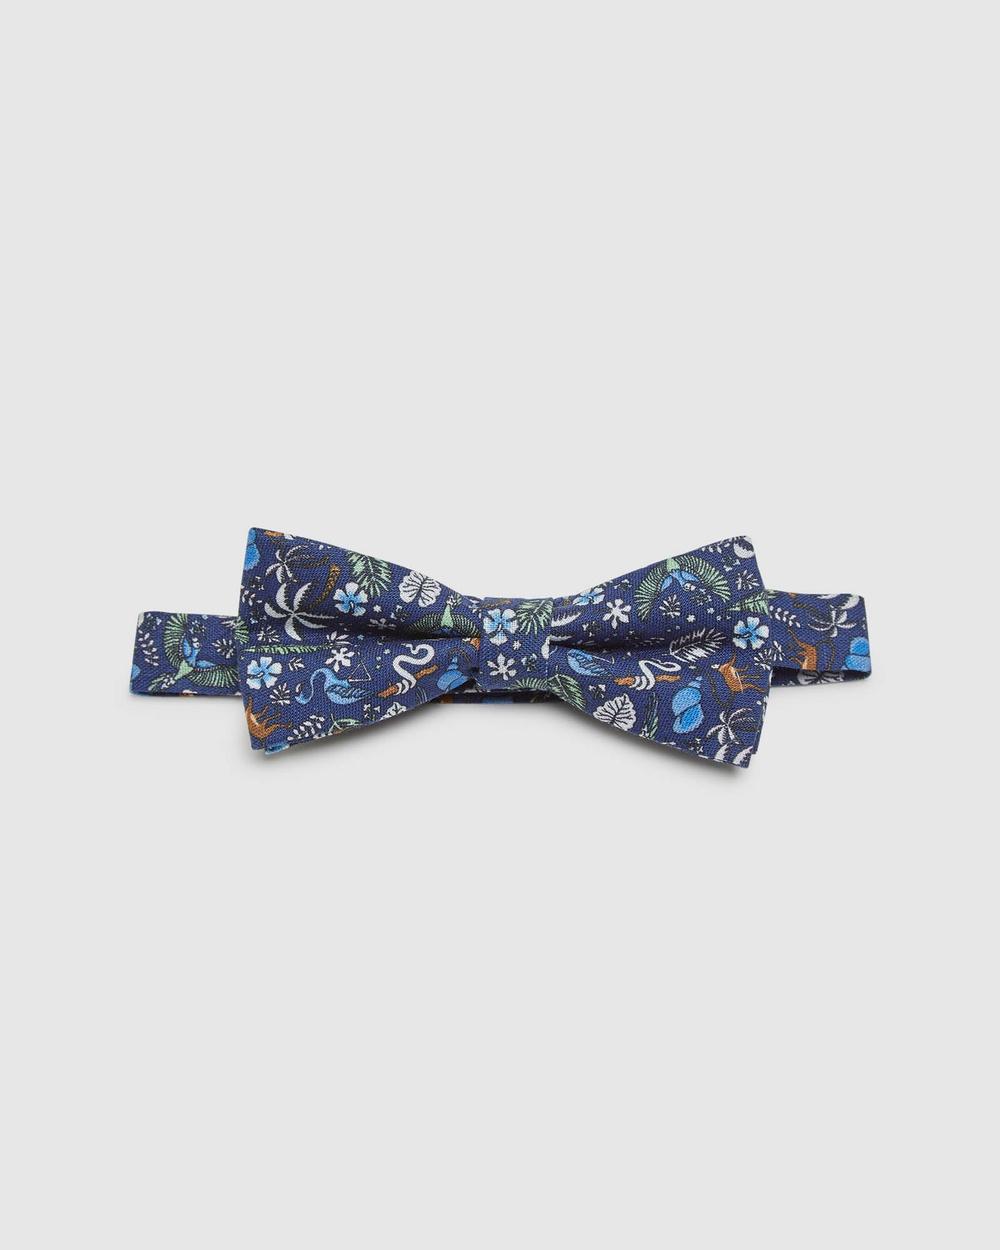 Oxford Linen Tropical Bow Tie Ties Blue Ties Australia